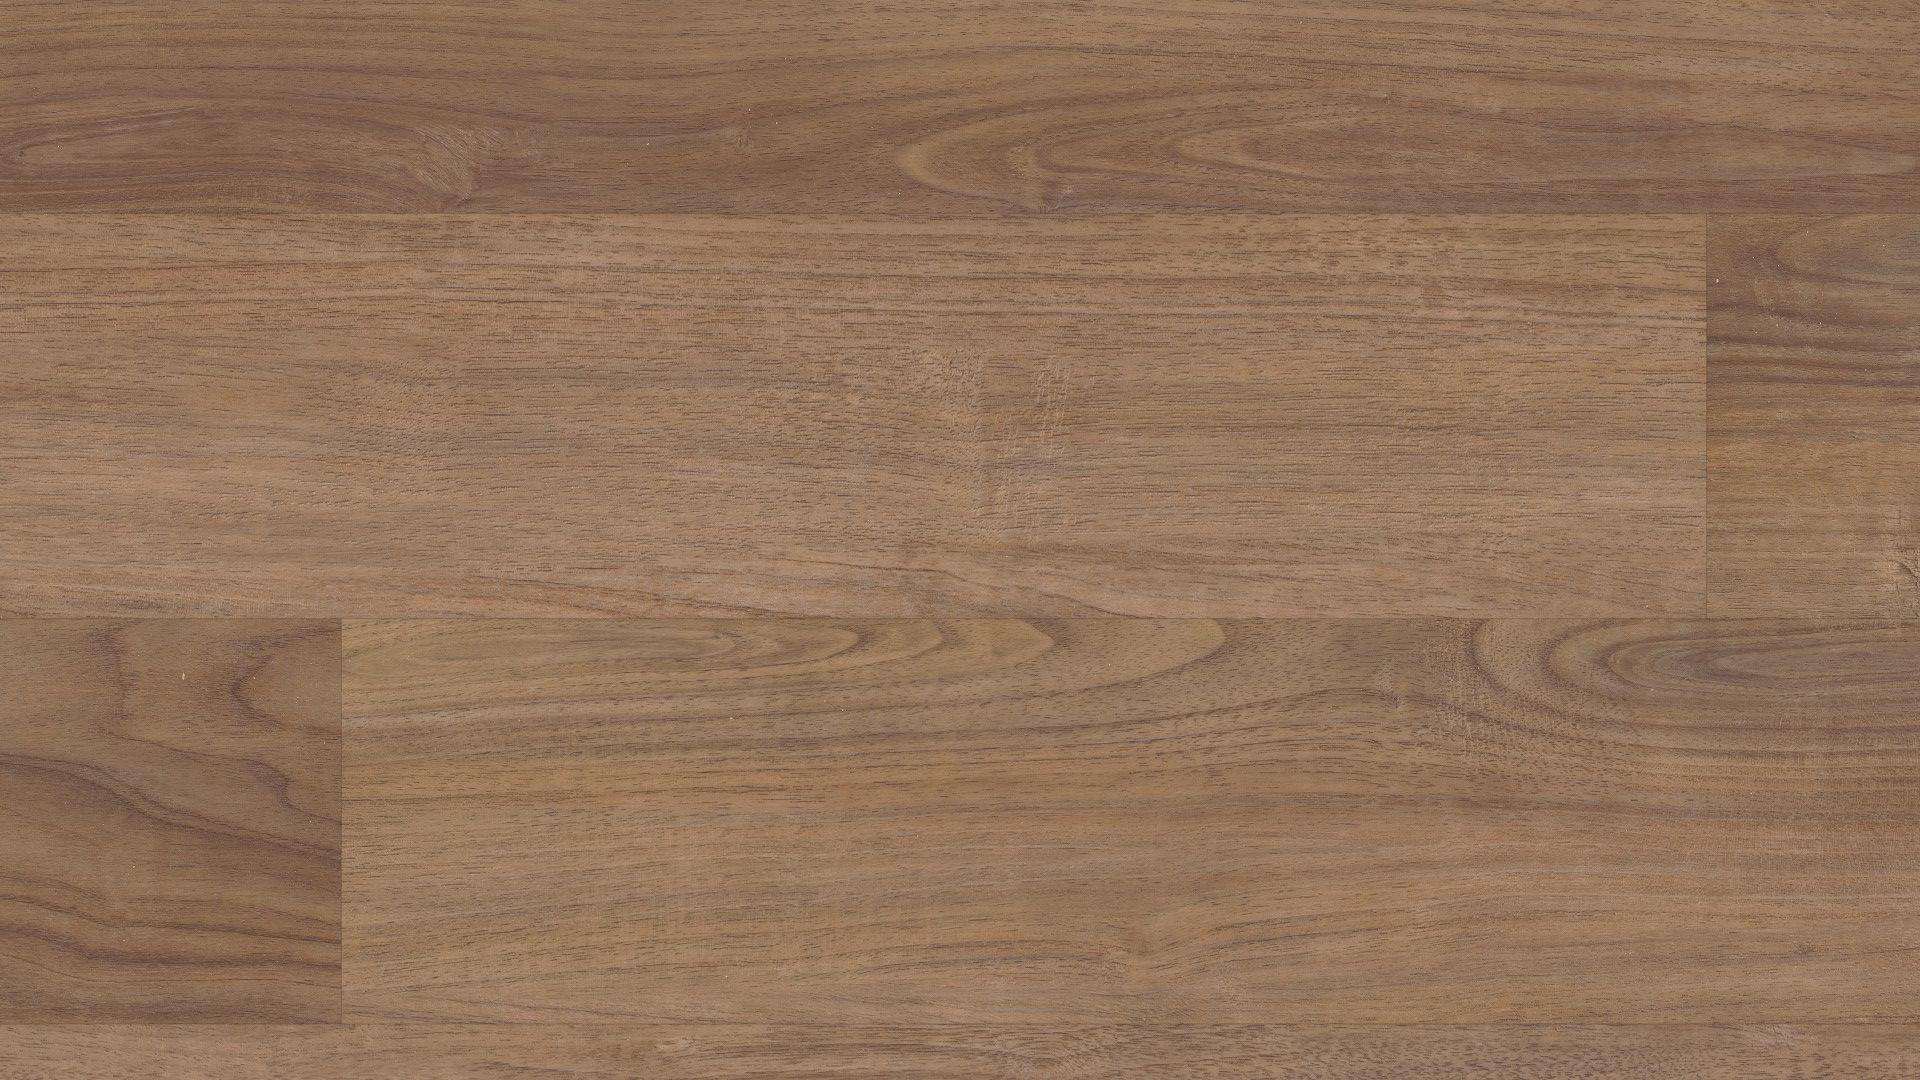 Dakota Walnut Coretec Plus 5 Plank